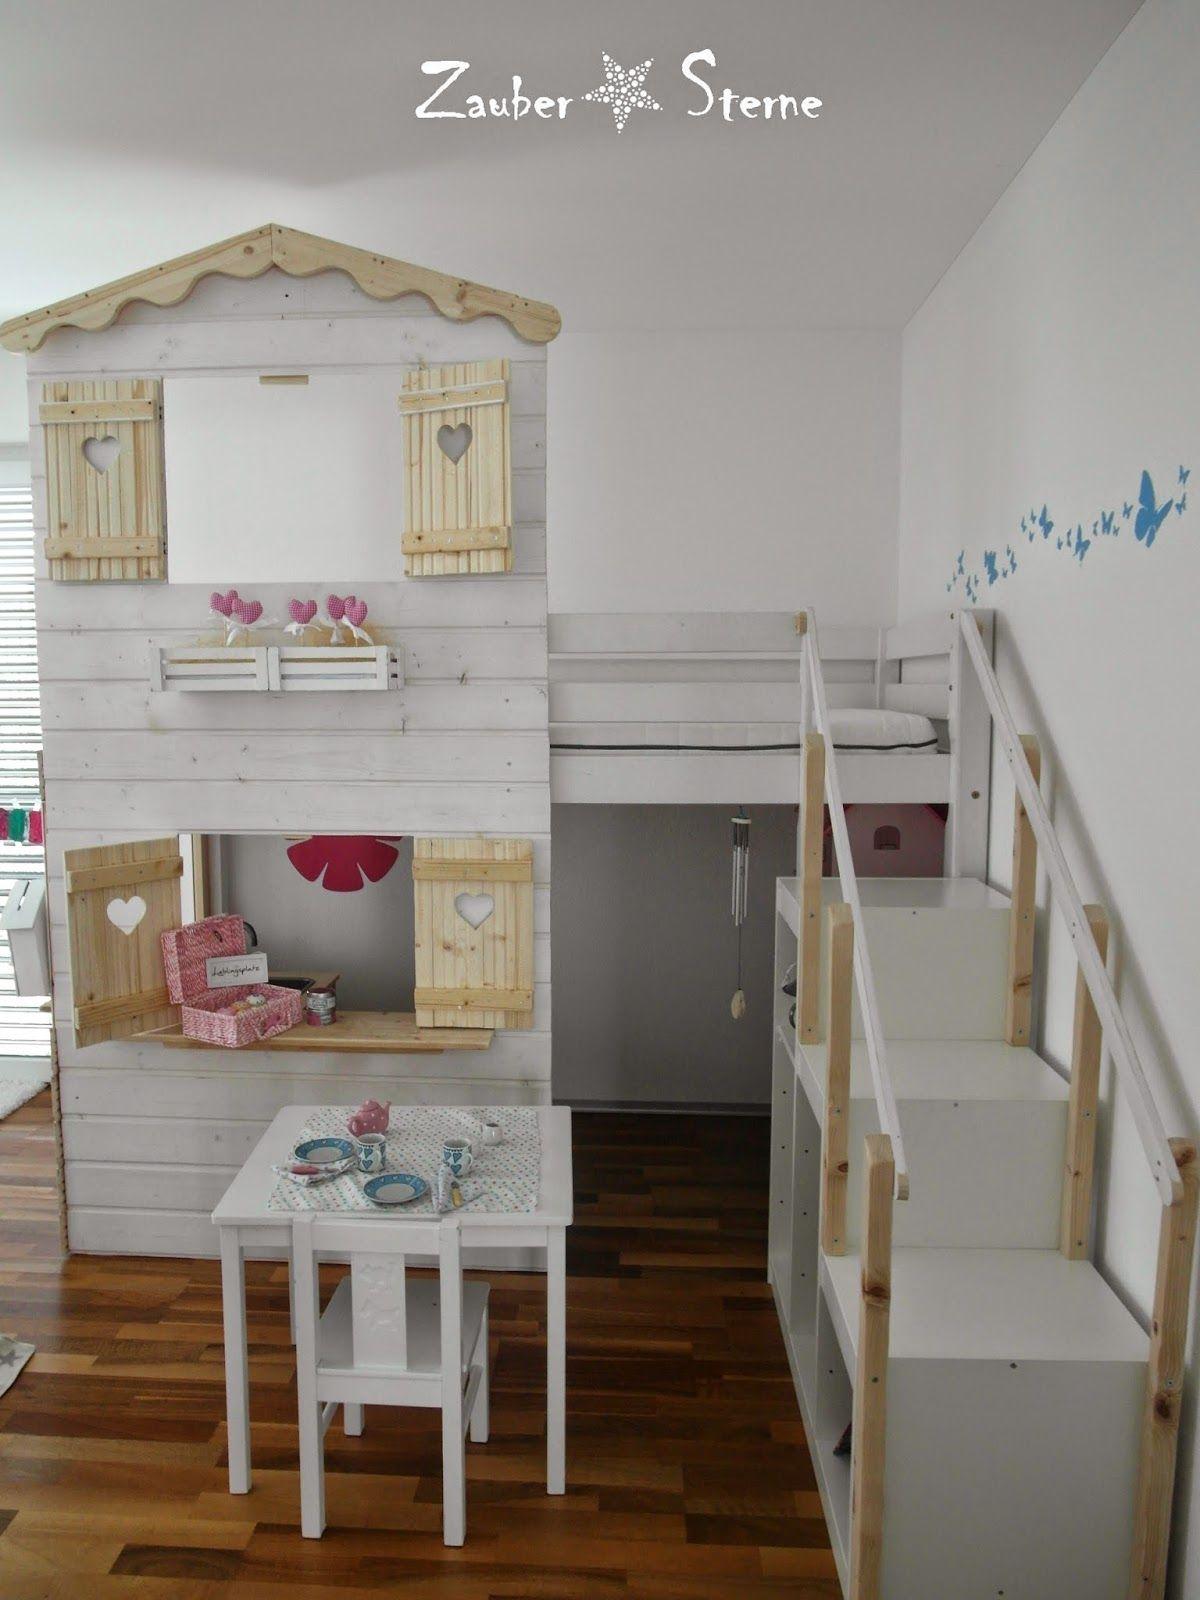 Holzhaus mit balken pokoje pinterest sterne raum - Kinderzimmer holzhaus ...